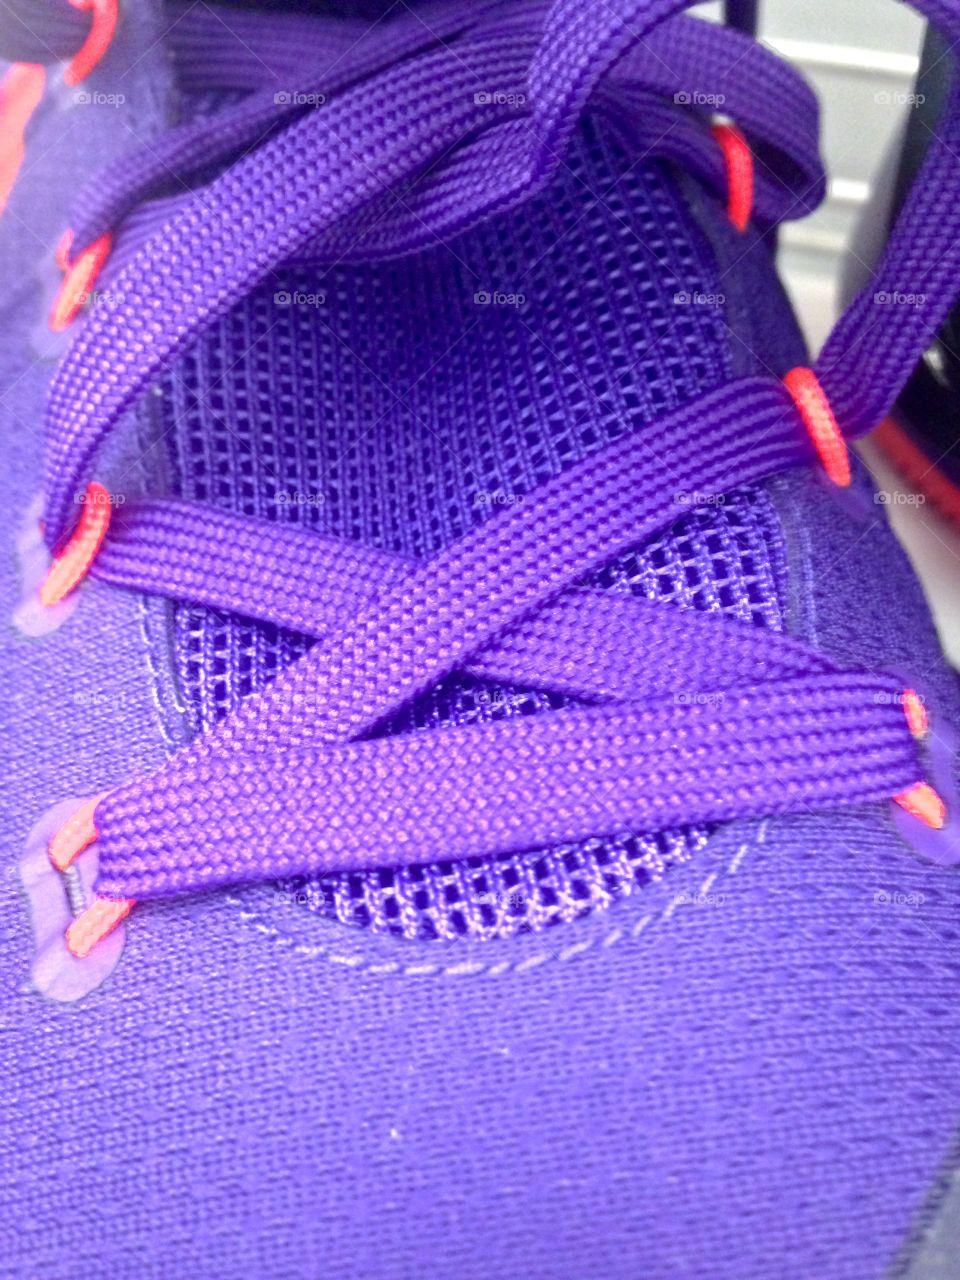 Purple Basketball Shoes  Published by: HappyBrownMonkey